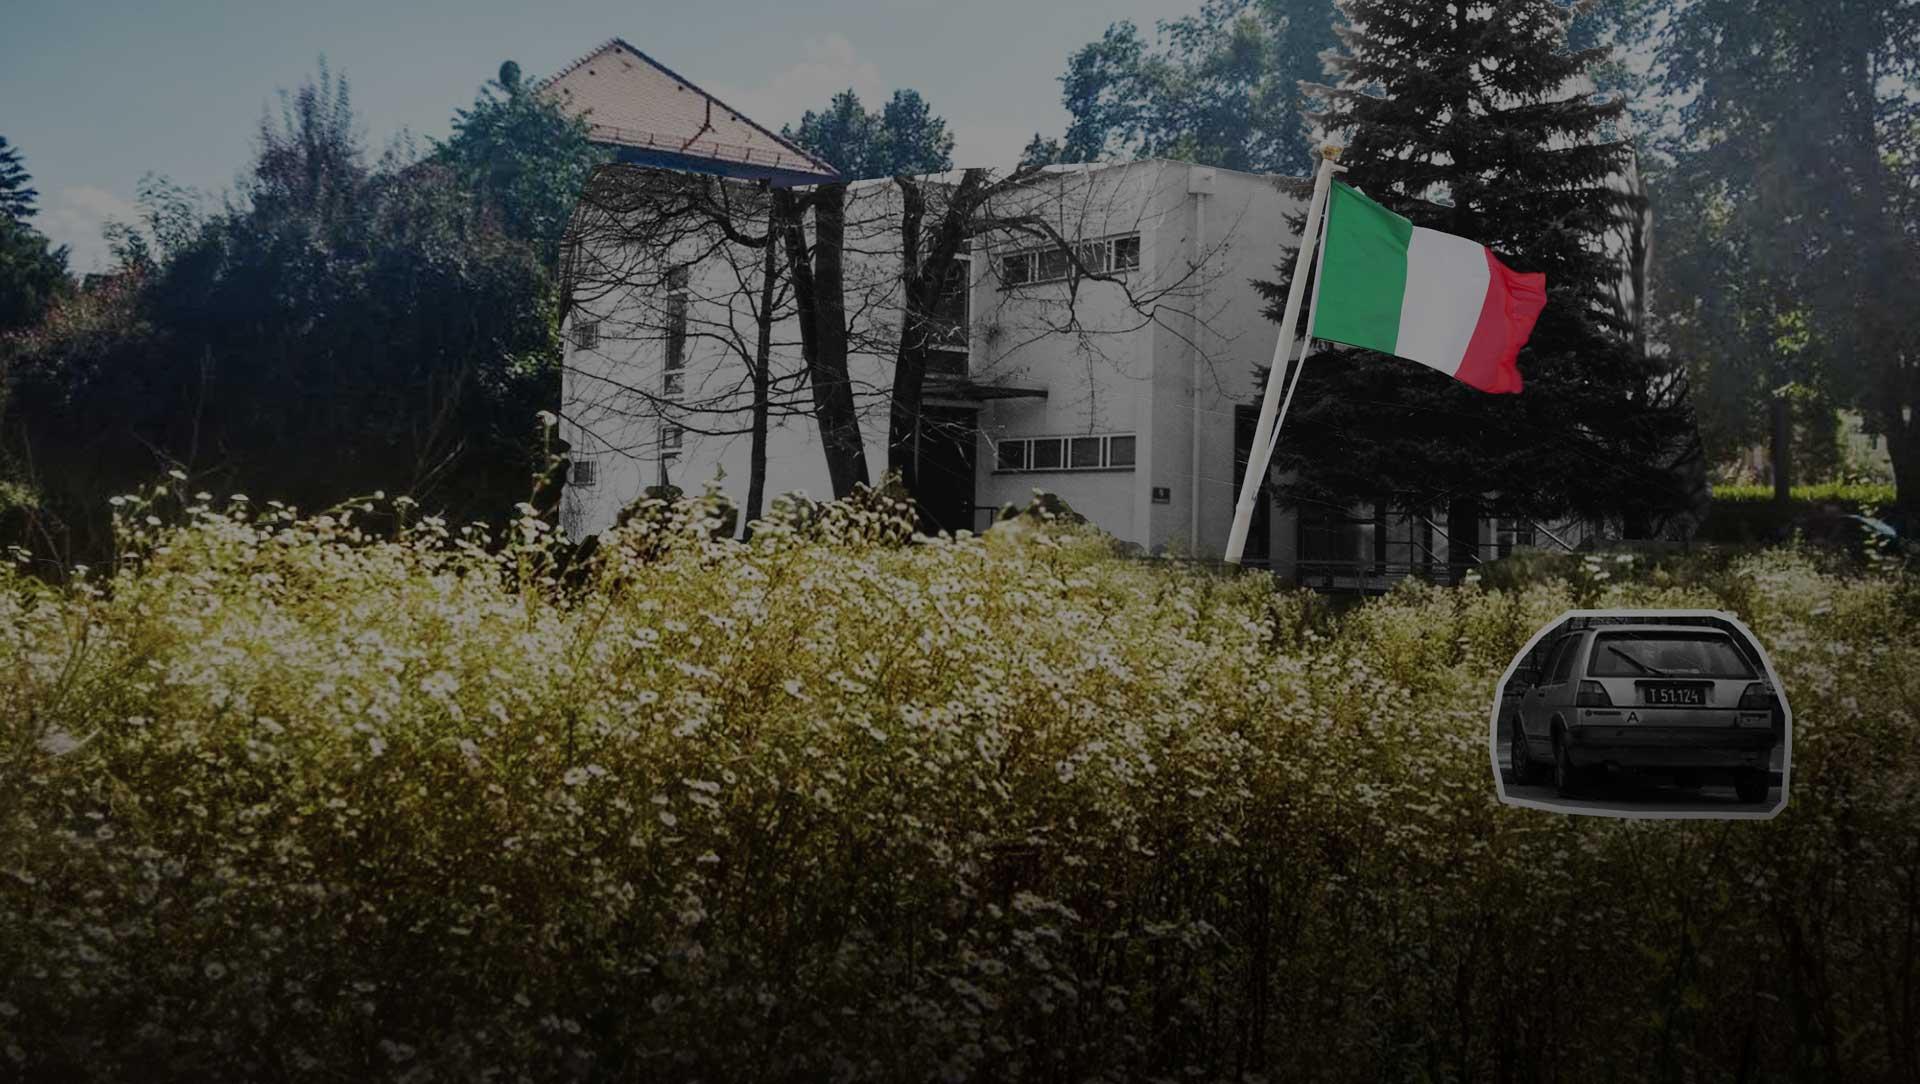 Da waren wir schon! <br />INNSBRUCK'S <br />LITTLE ITALY